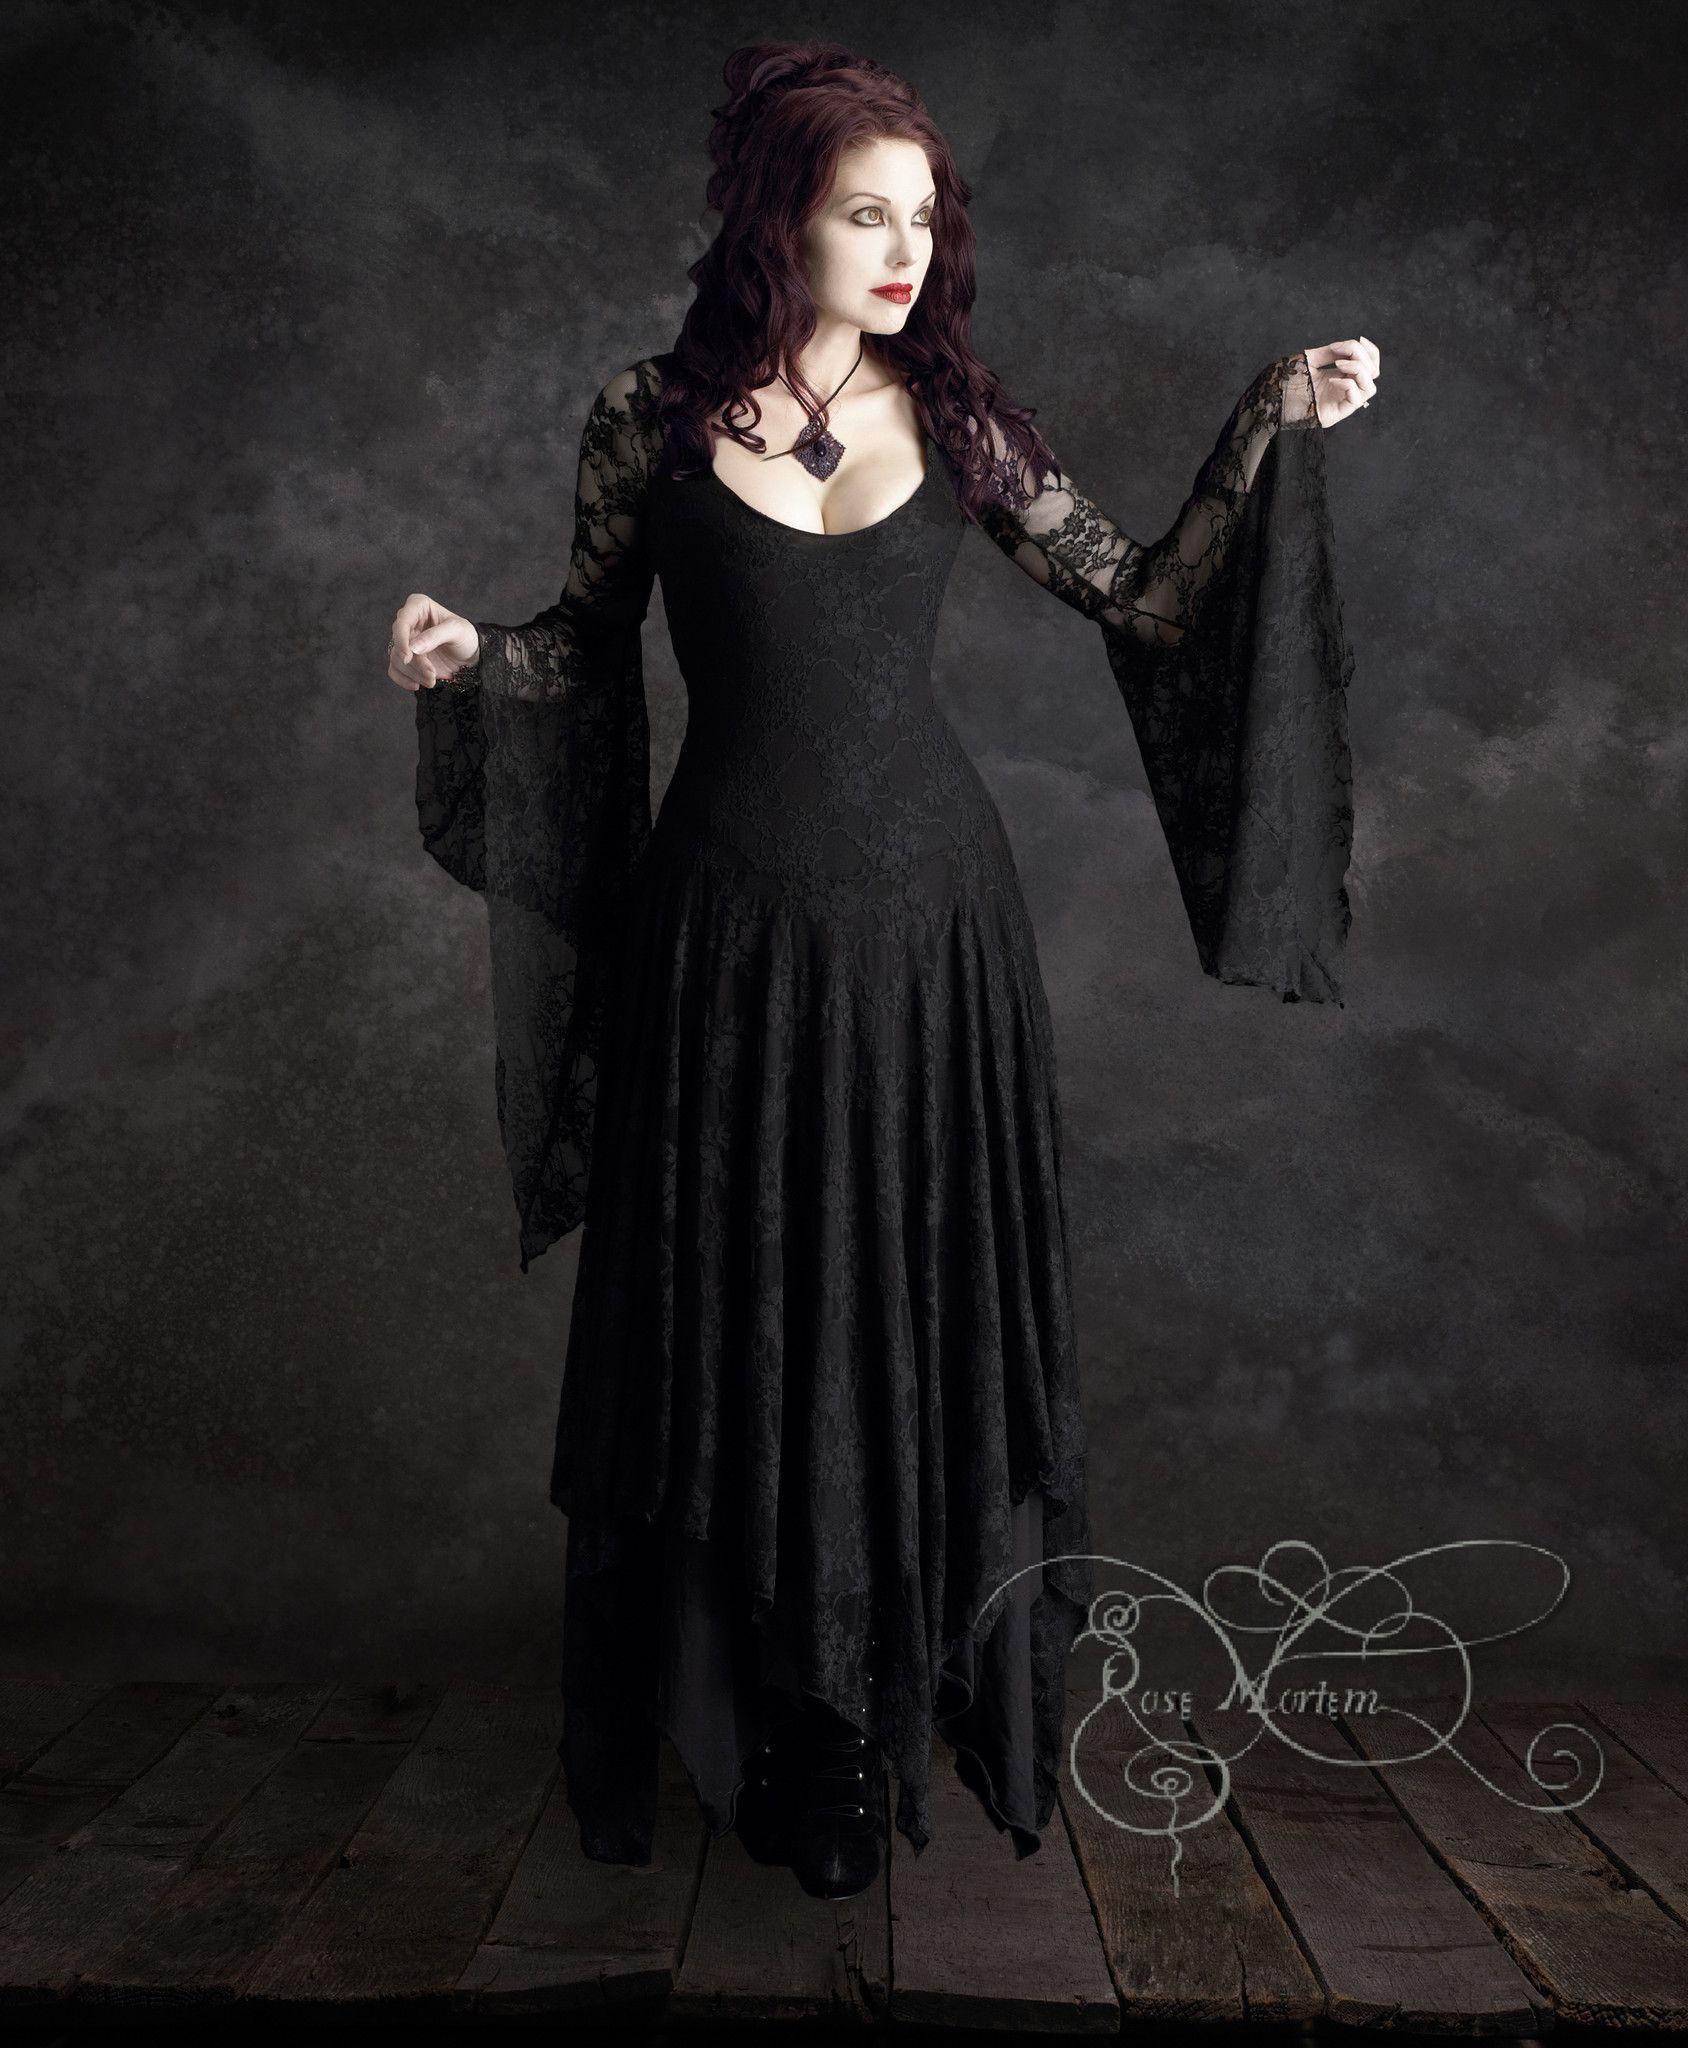 Long sleeve black wedding dresses  Annaleah Fairy Tale Romantic Lace Wedding Dress  LoZ  Pinterest